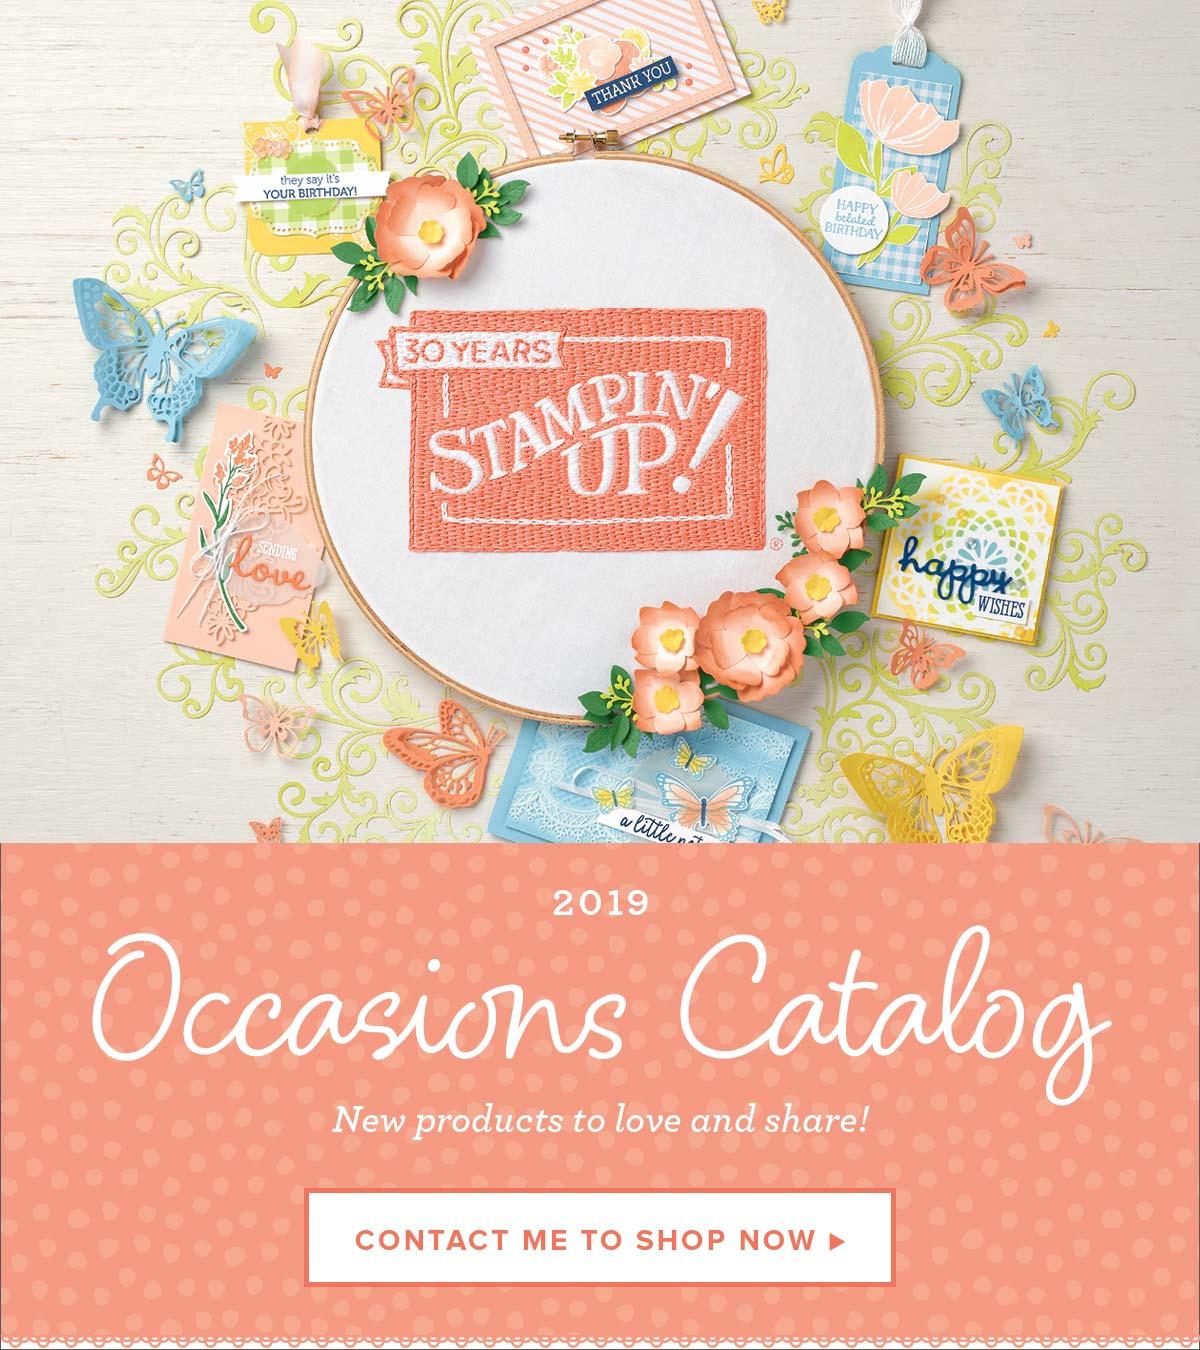 Occasion Catalog